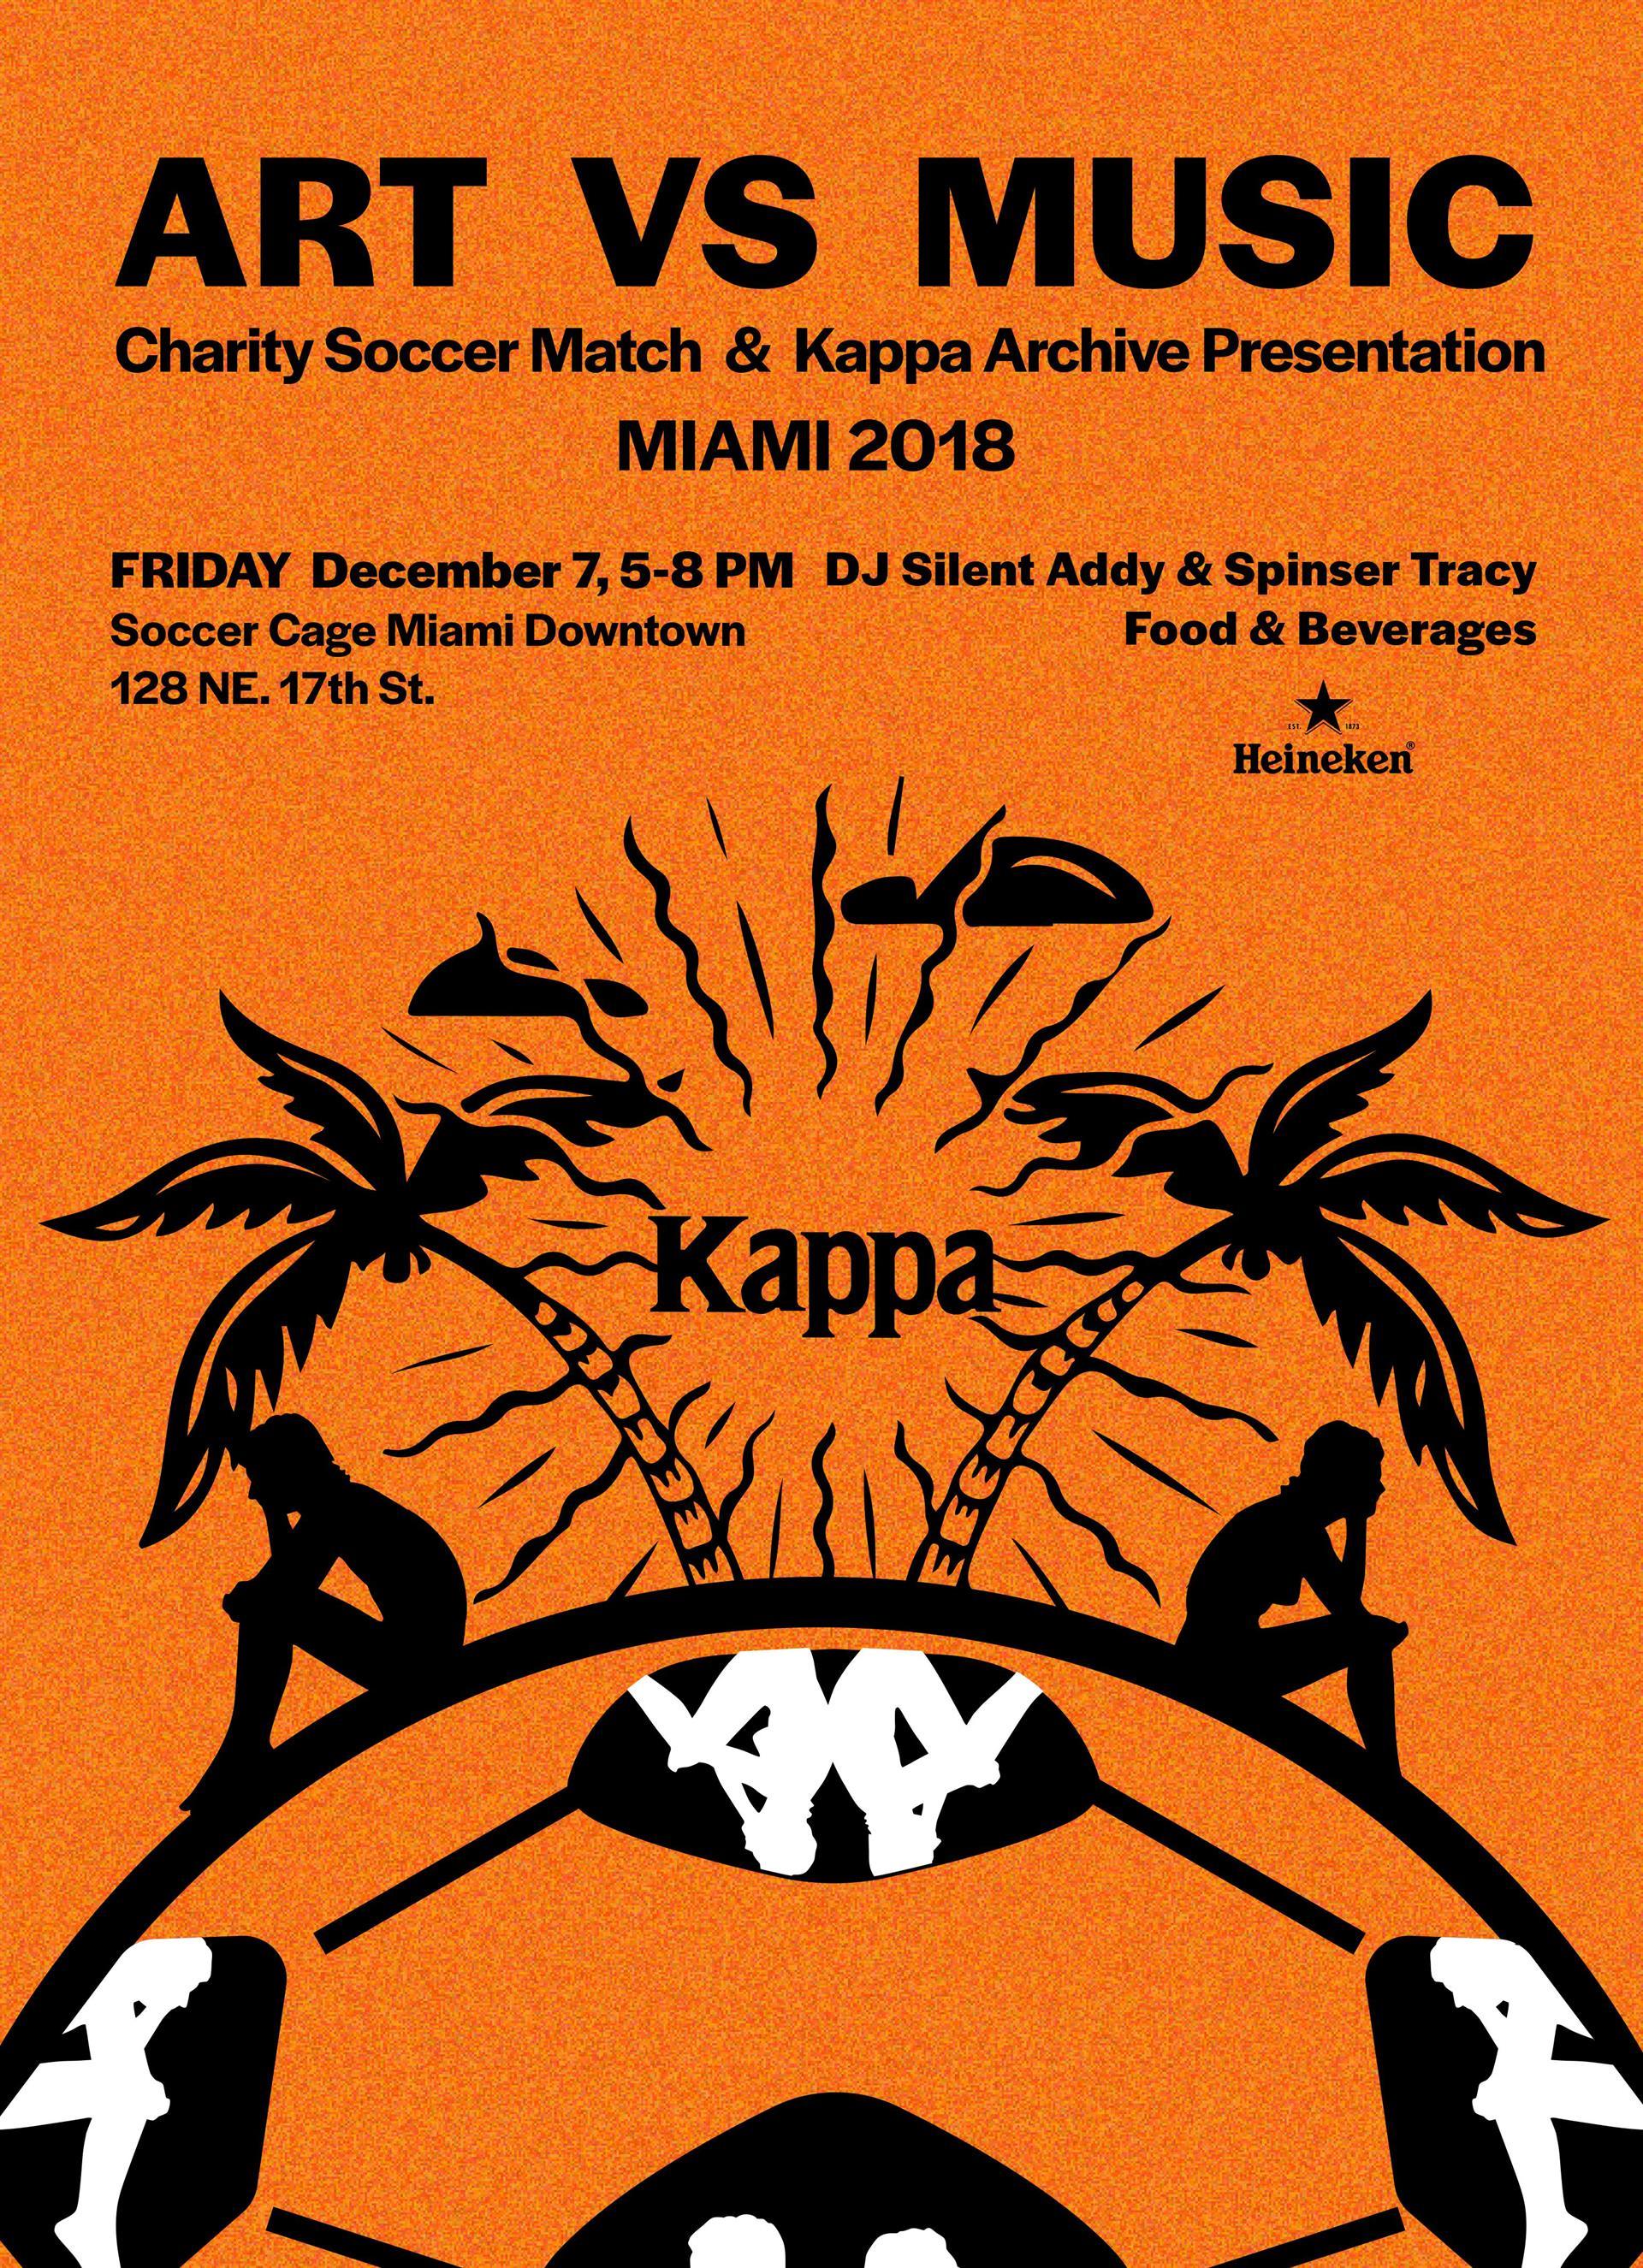 kappa soccer party - art basel 2018 - florum fashion magazine .jpg